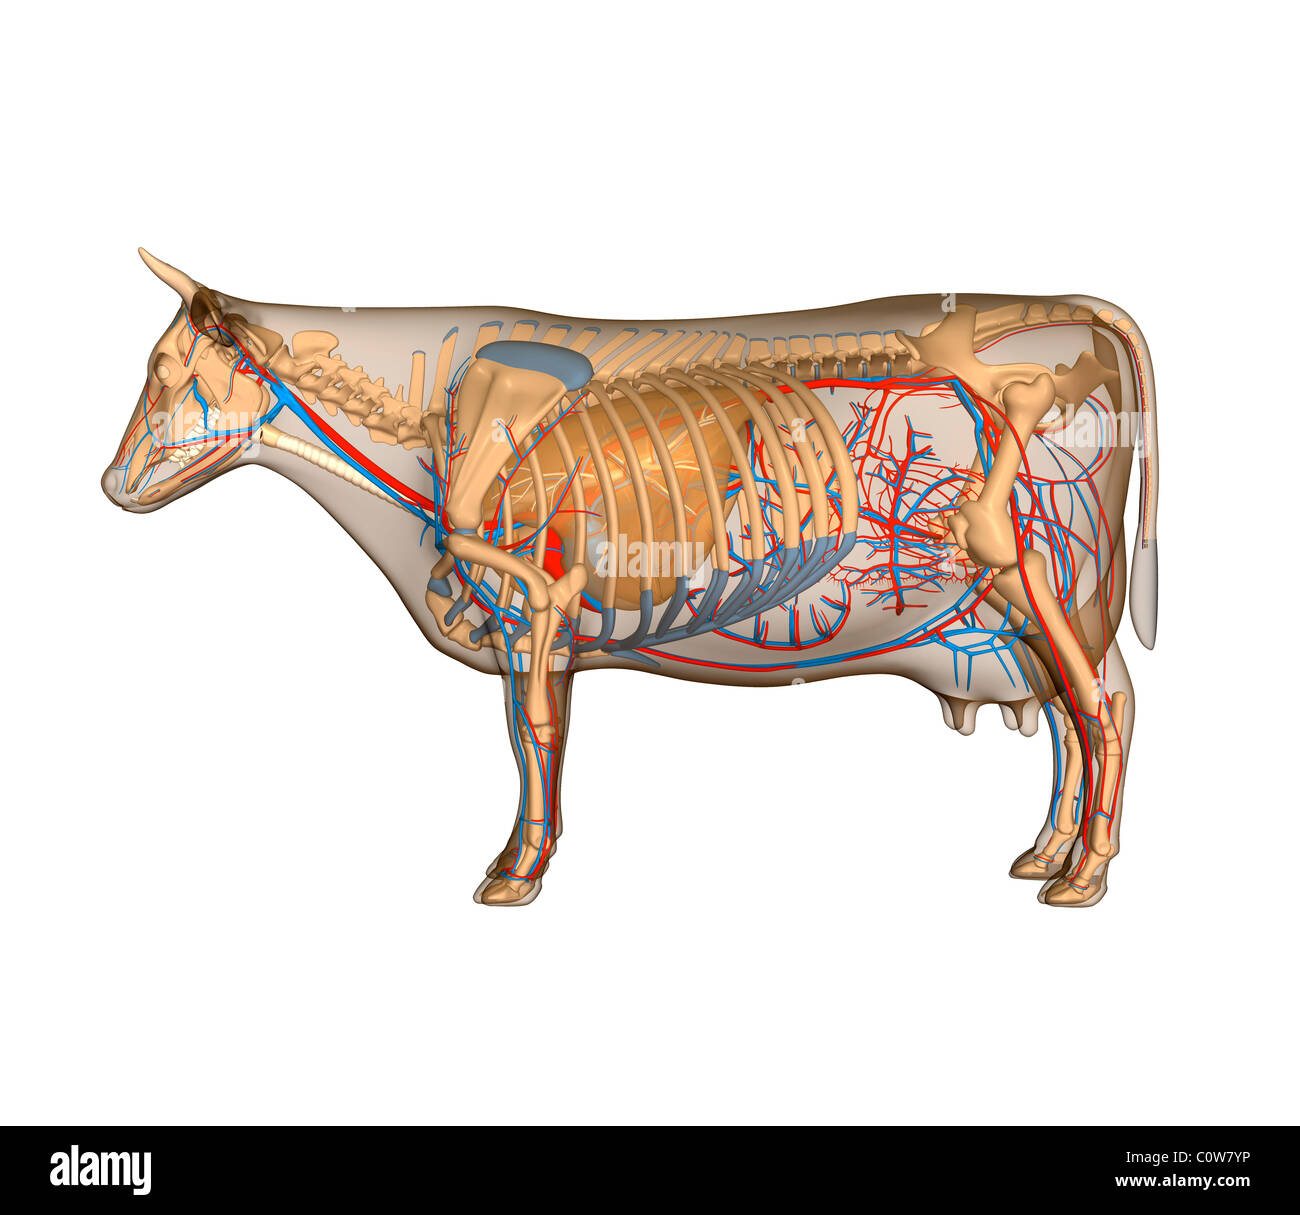 Cow Anatomy Stock Photos & Cow Anatomy Stock Images - Alamy